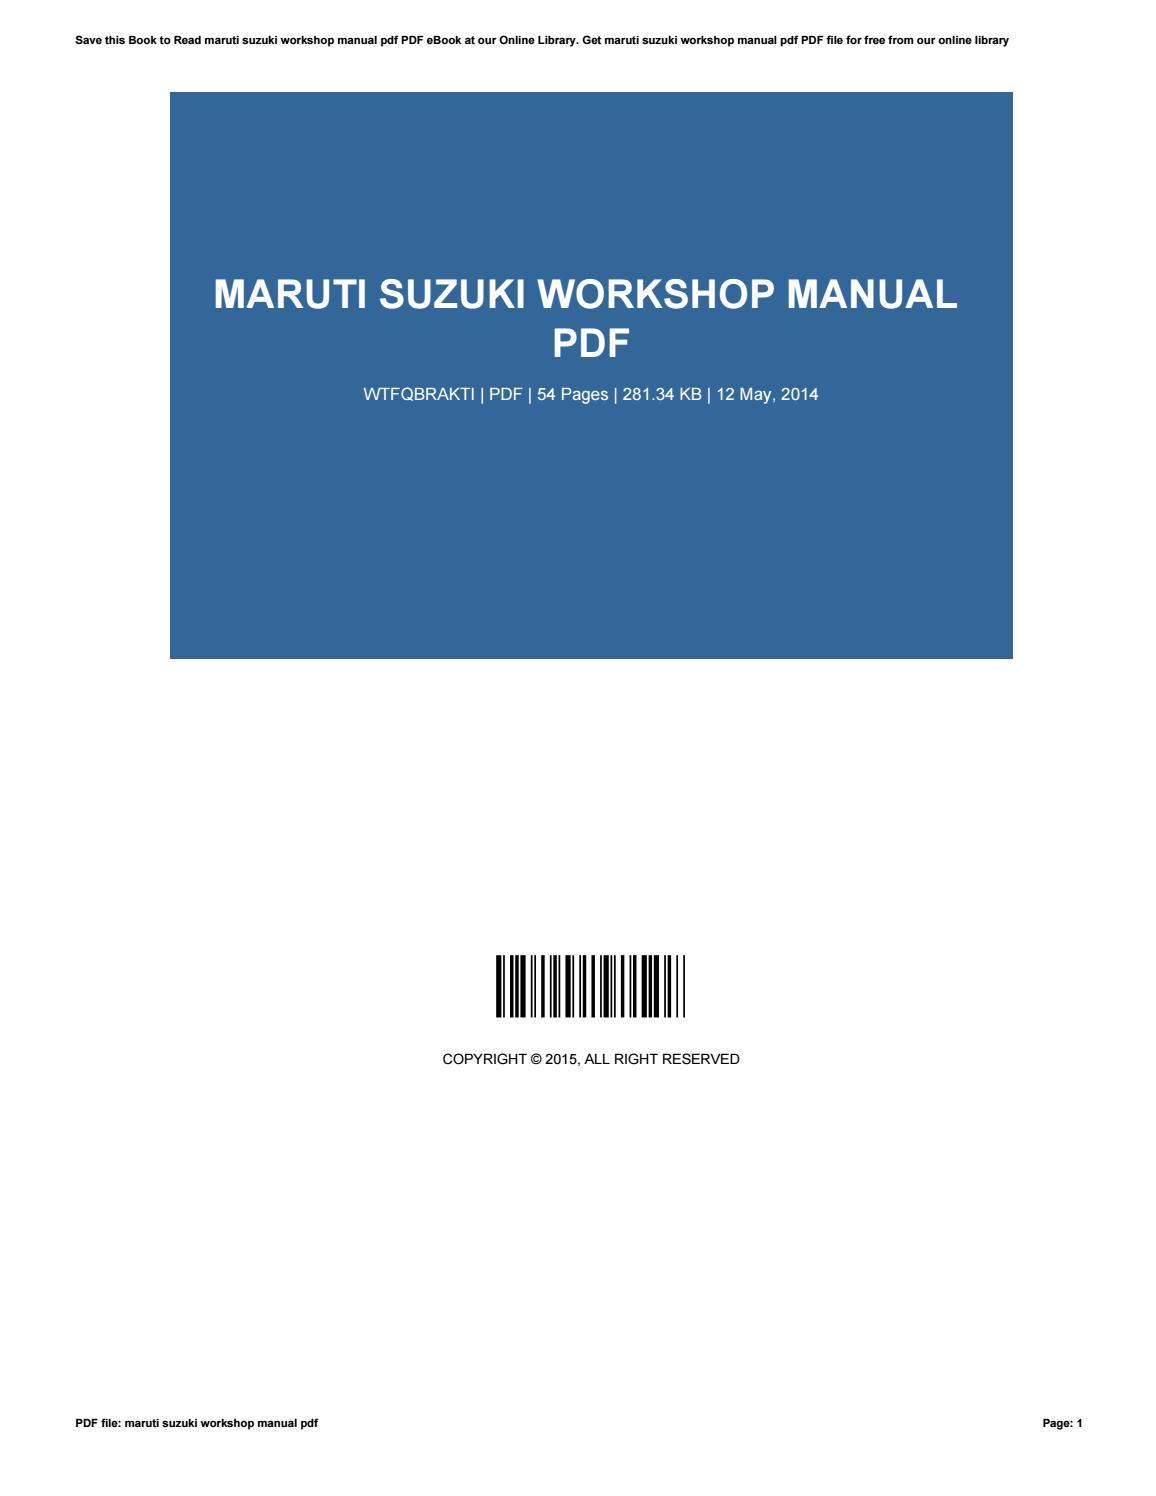 Maruti Suzuki Workshop Manual Pdf By Wendyadams4018